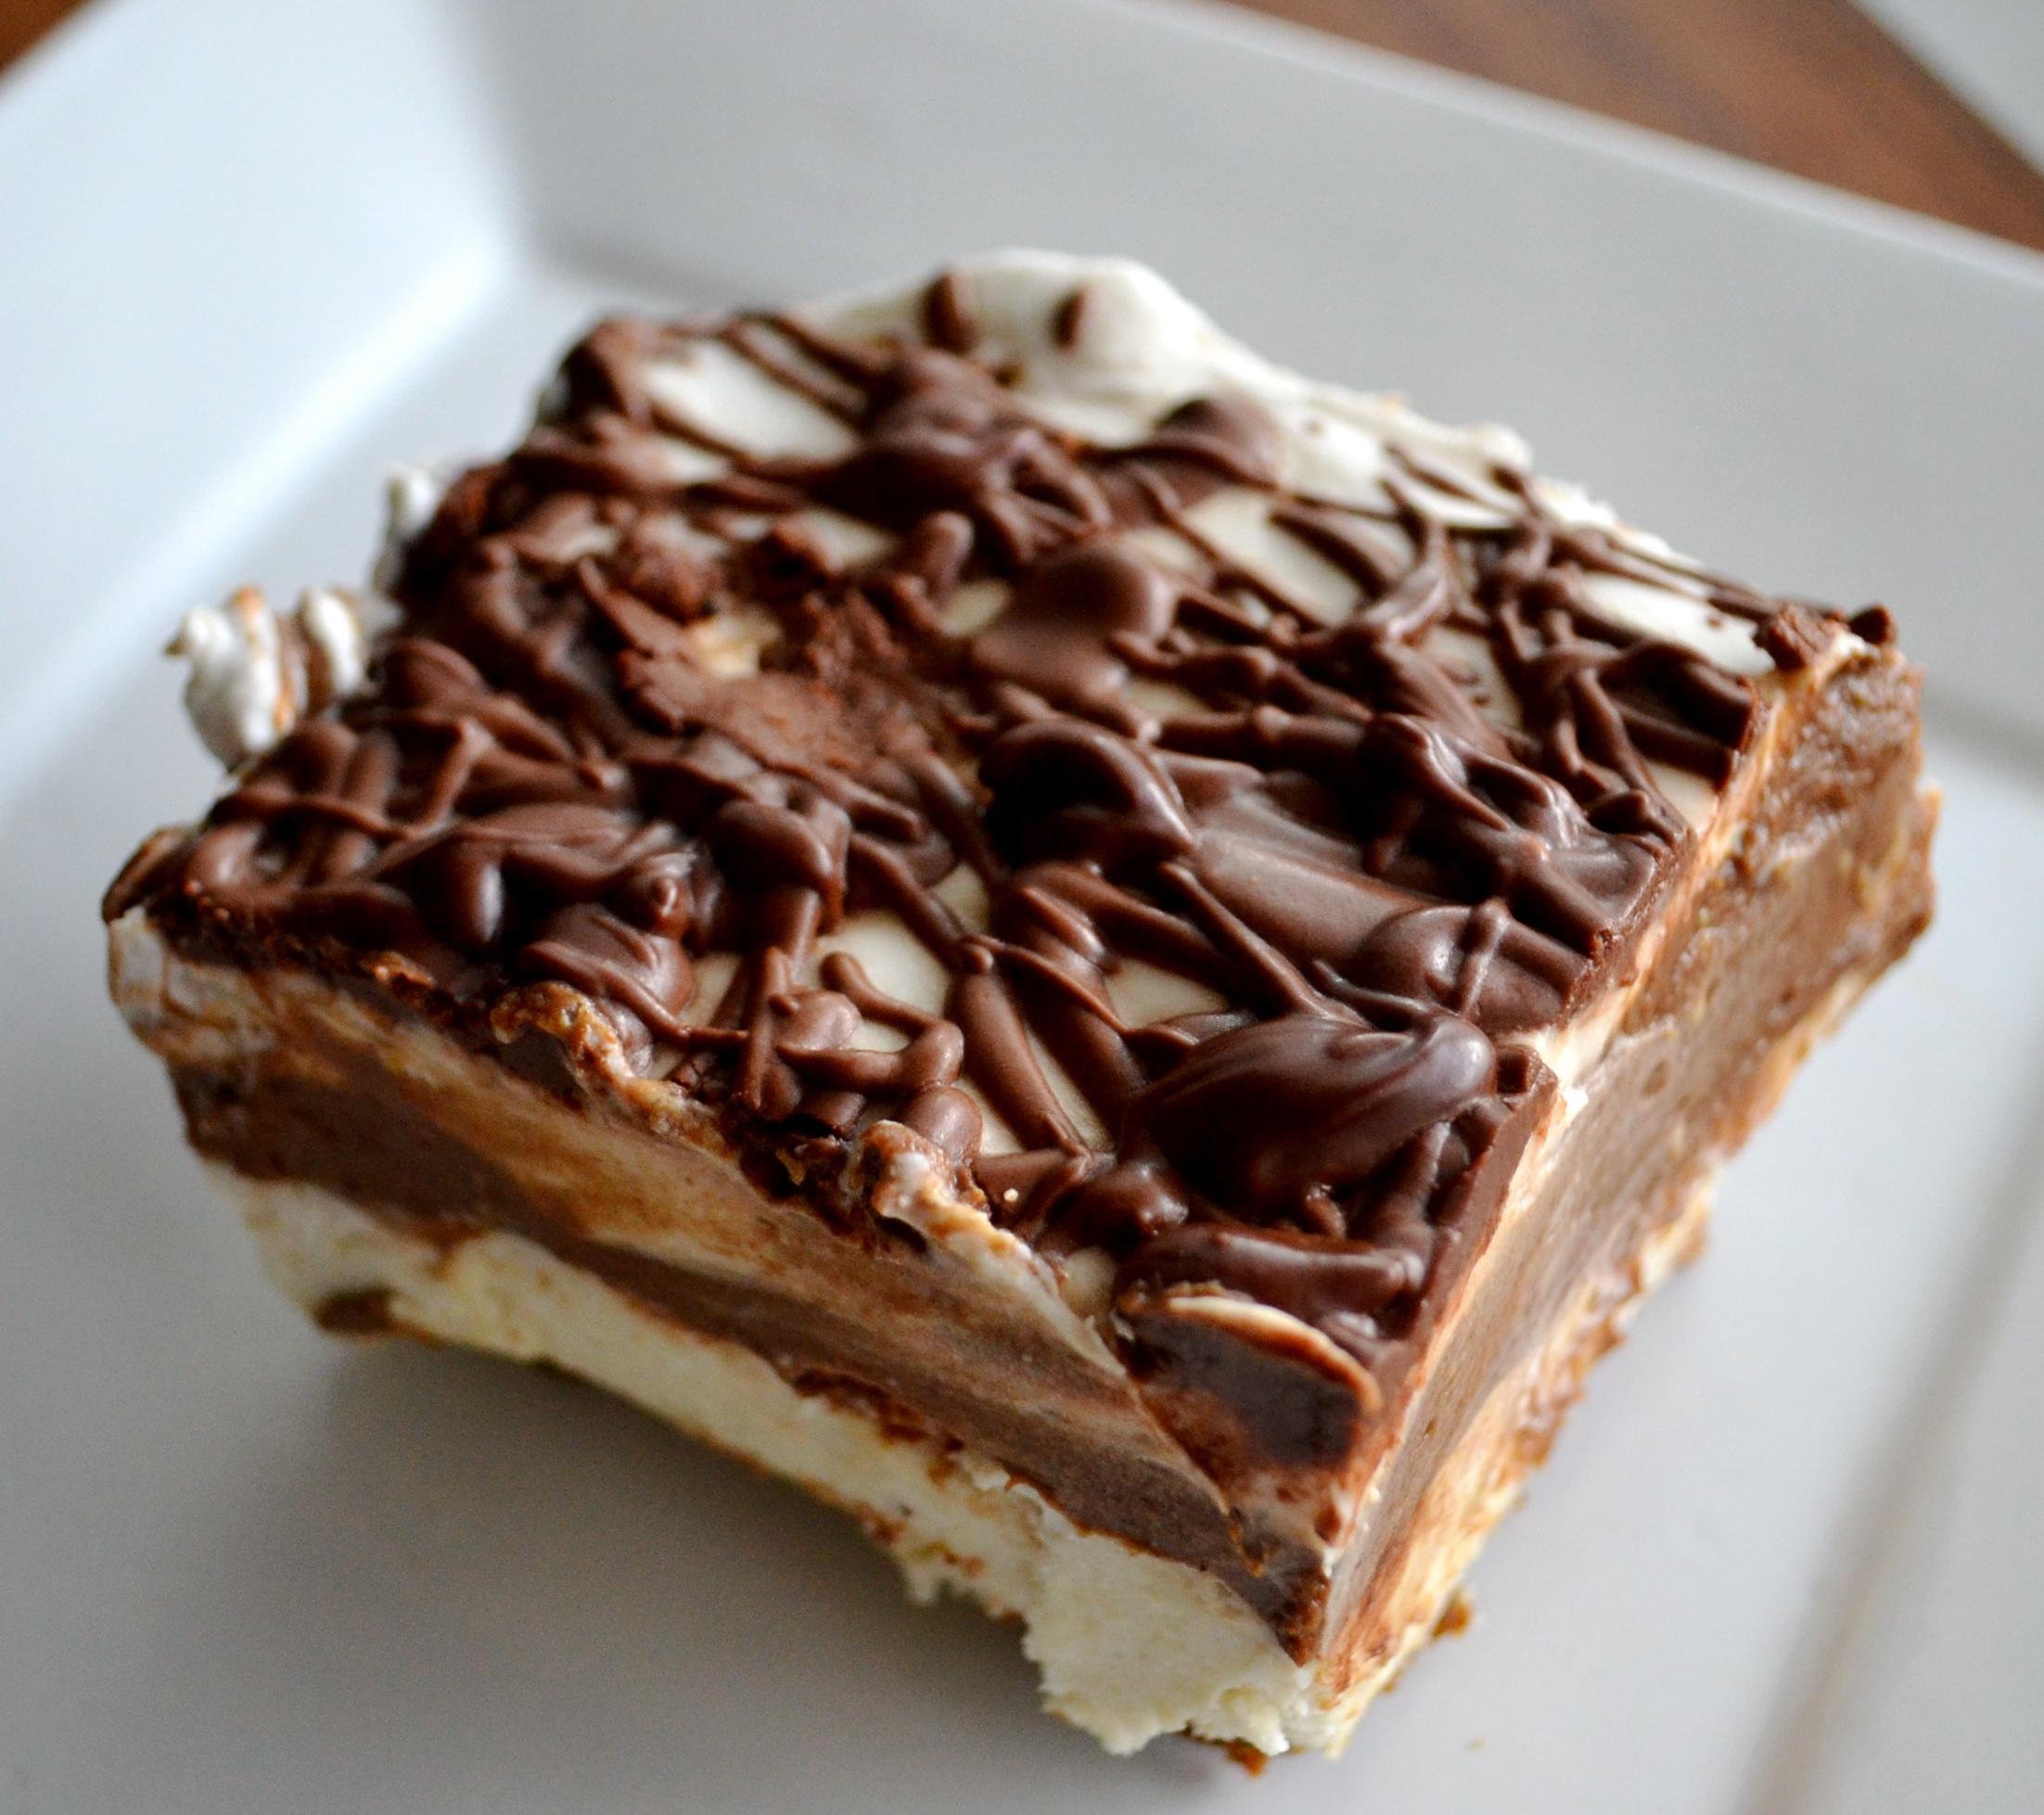 vegan_chocolate_dessert.jpg